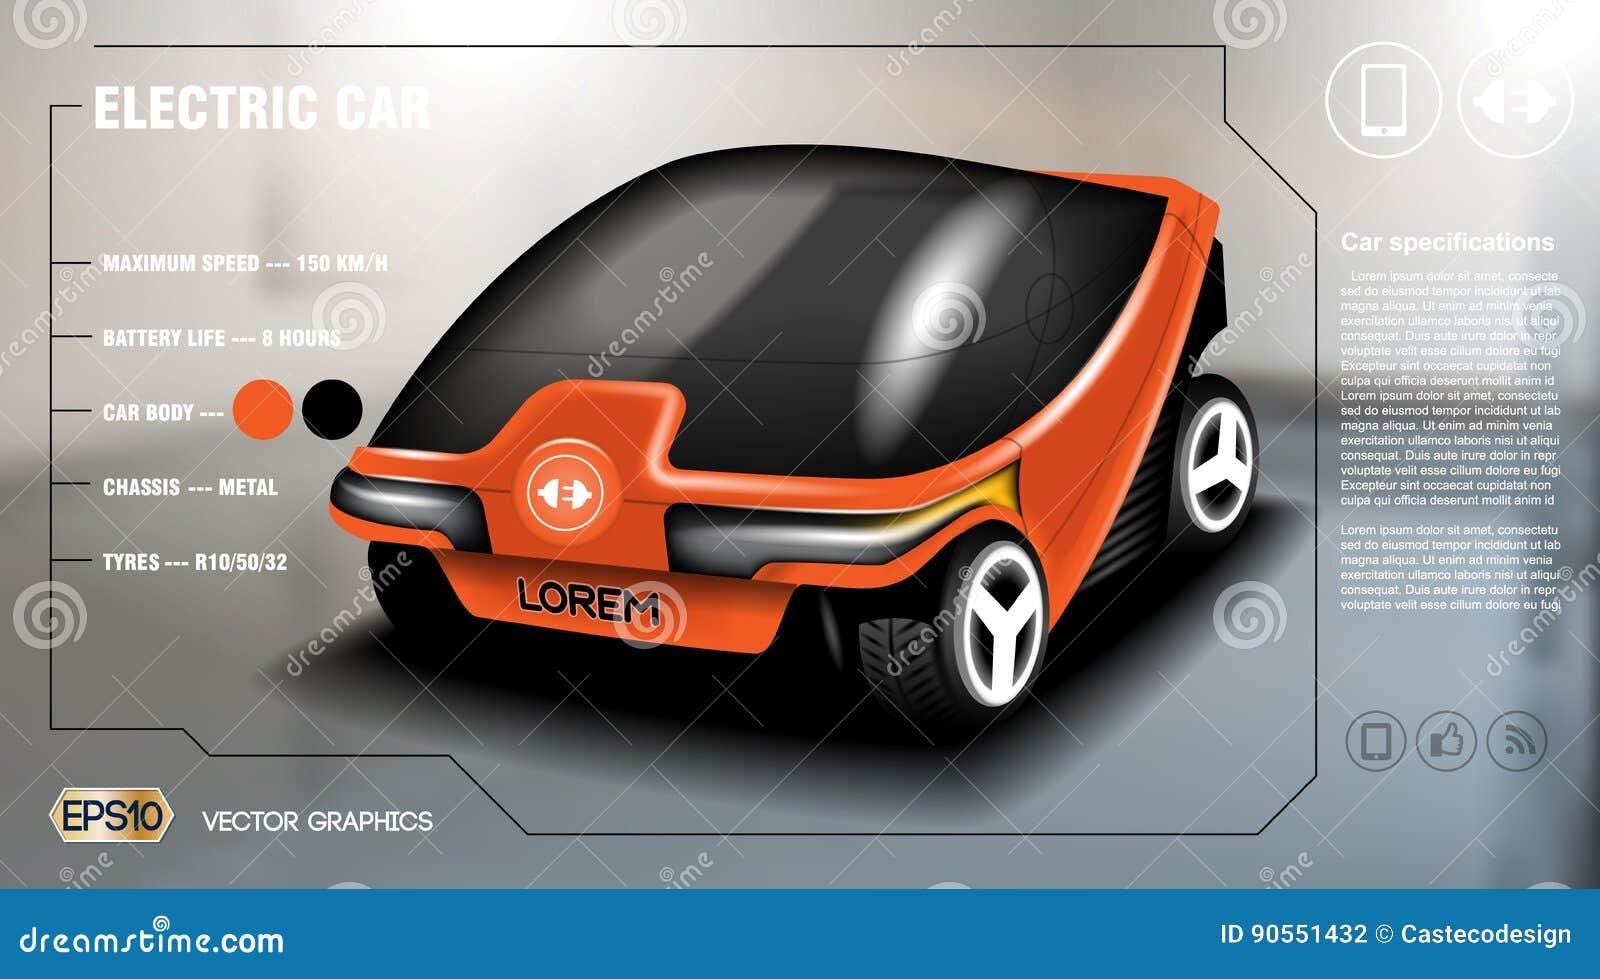 realistic 3d electric car info graphic concept. digital vector